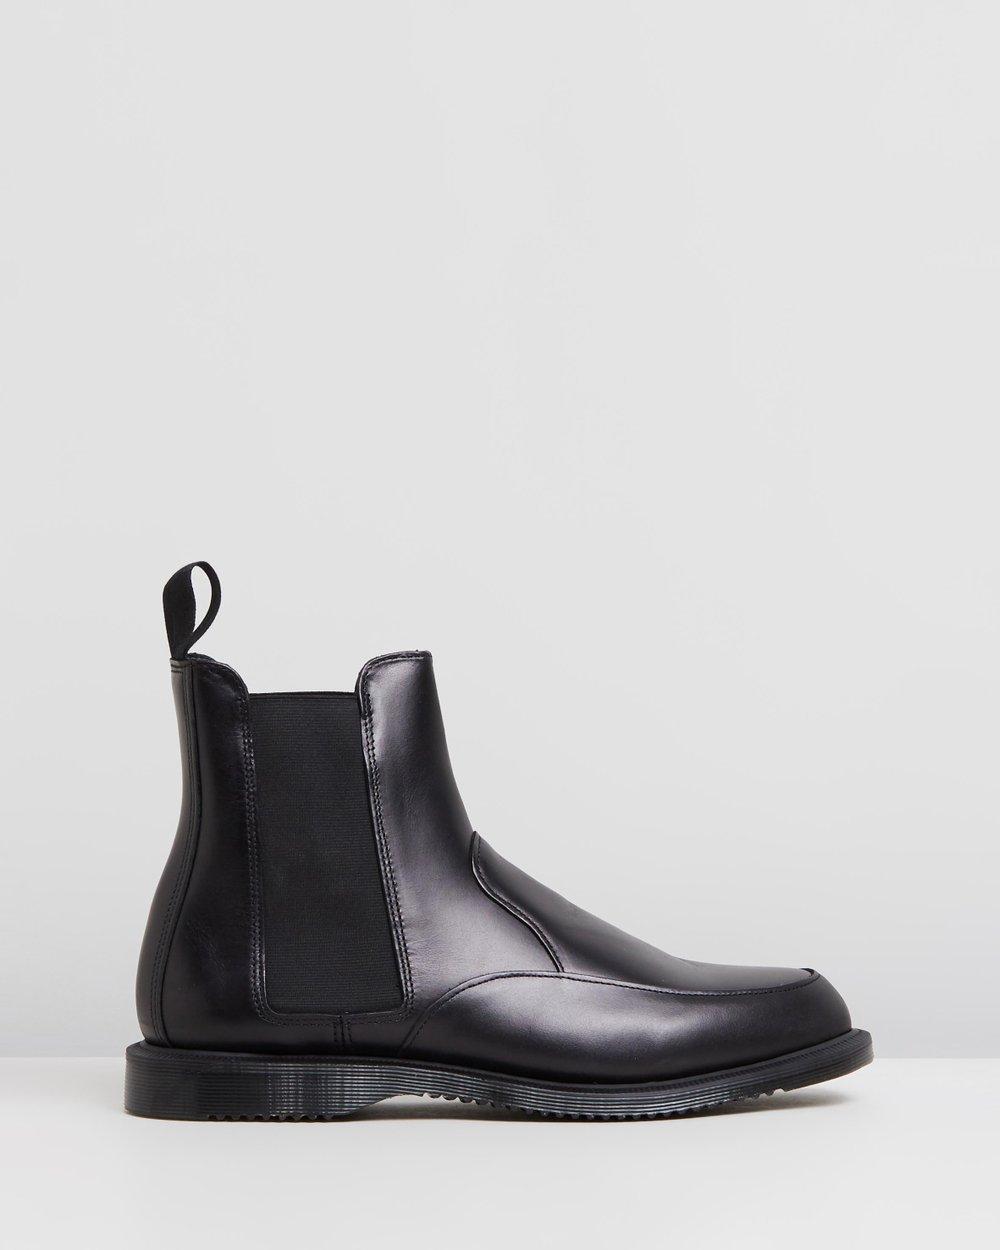 7a6fe982a95 Aimelya Kensington Boots - Women s by Dr Martens Online